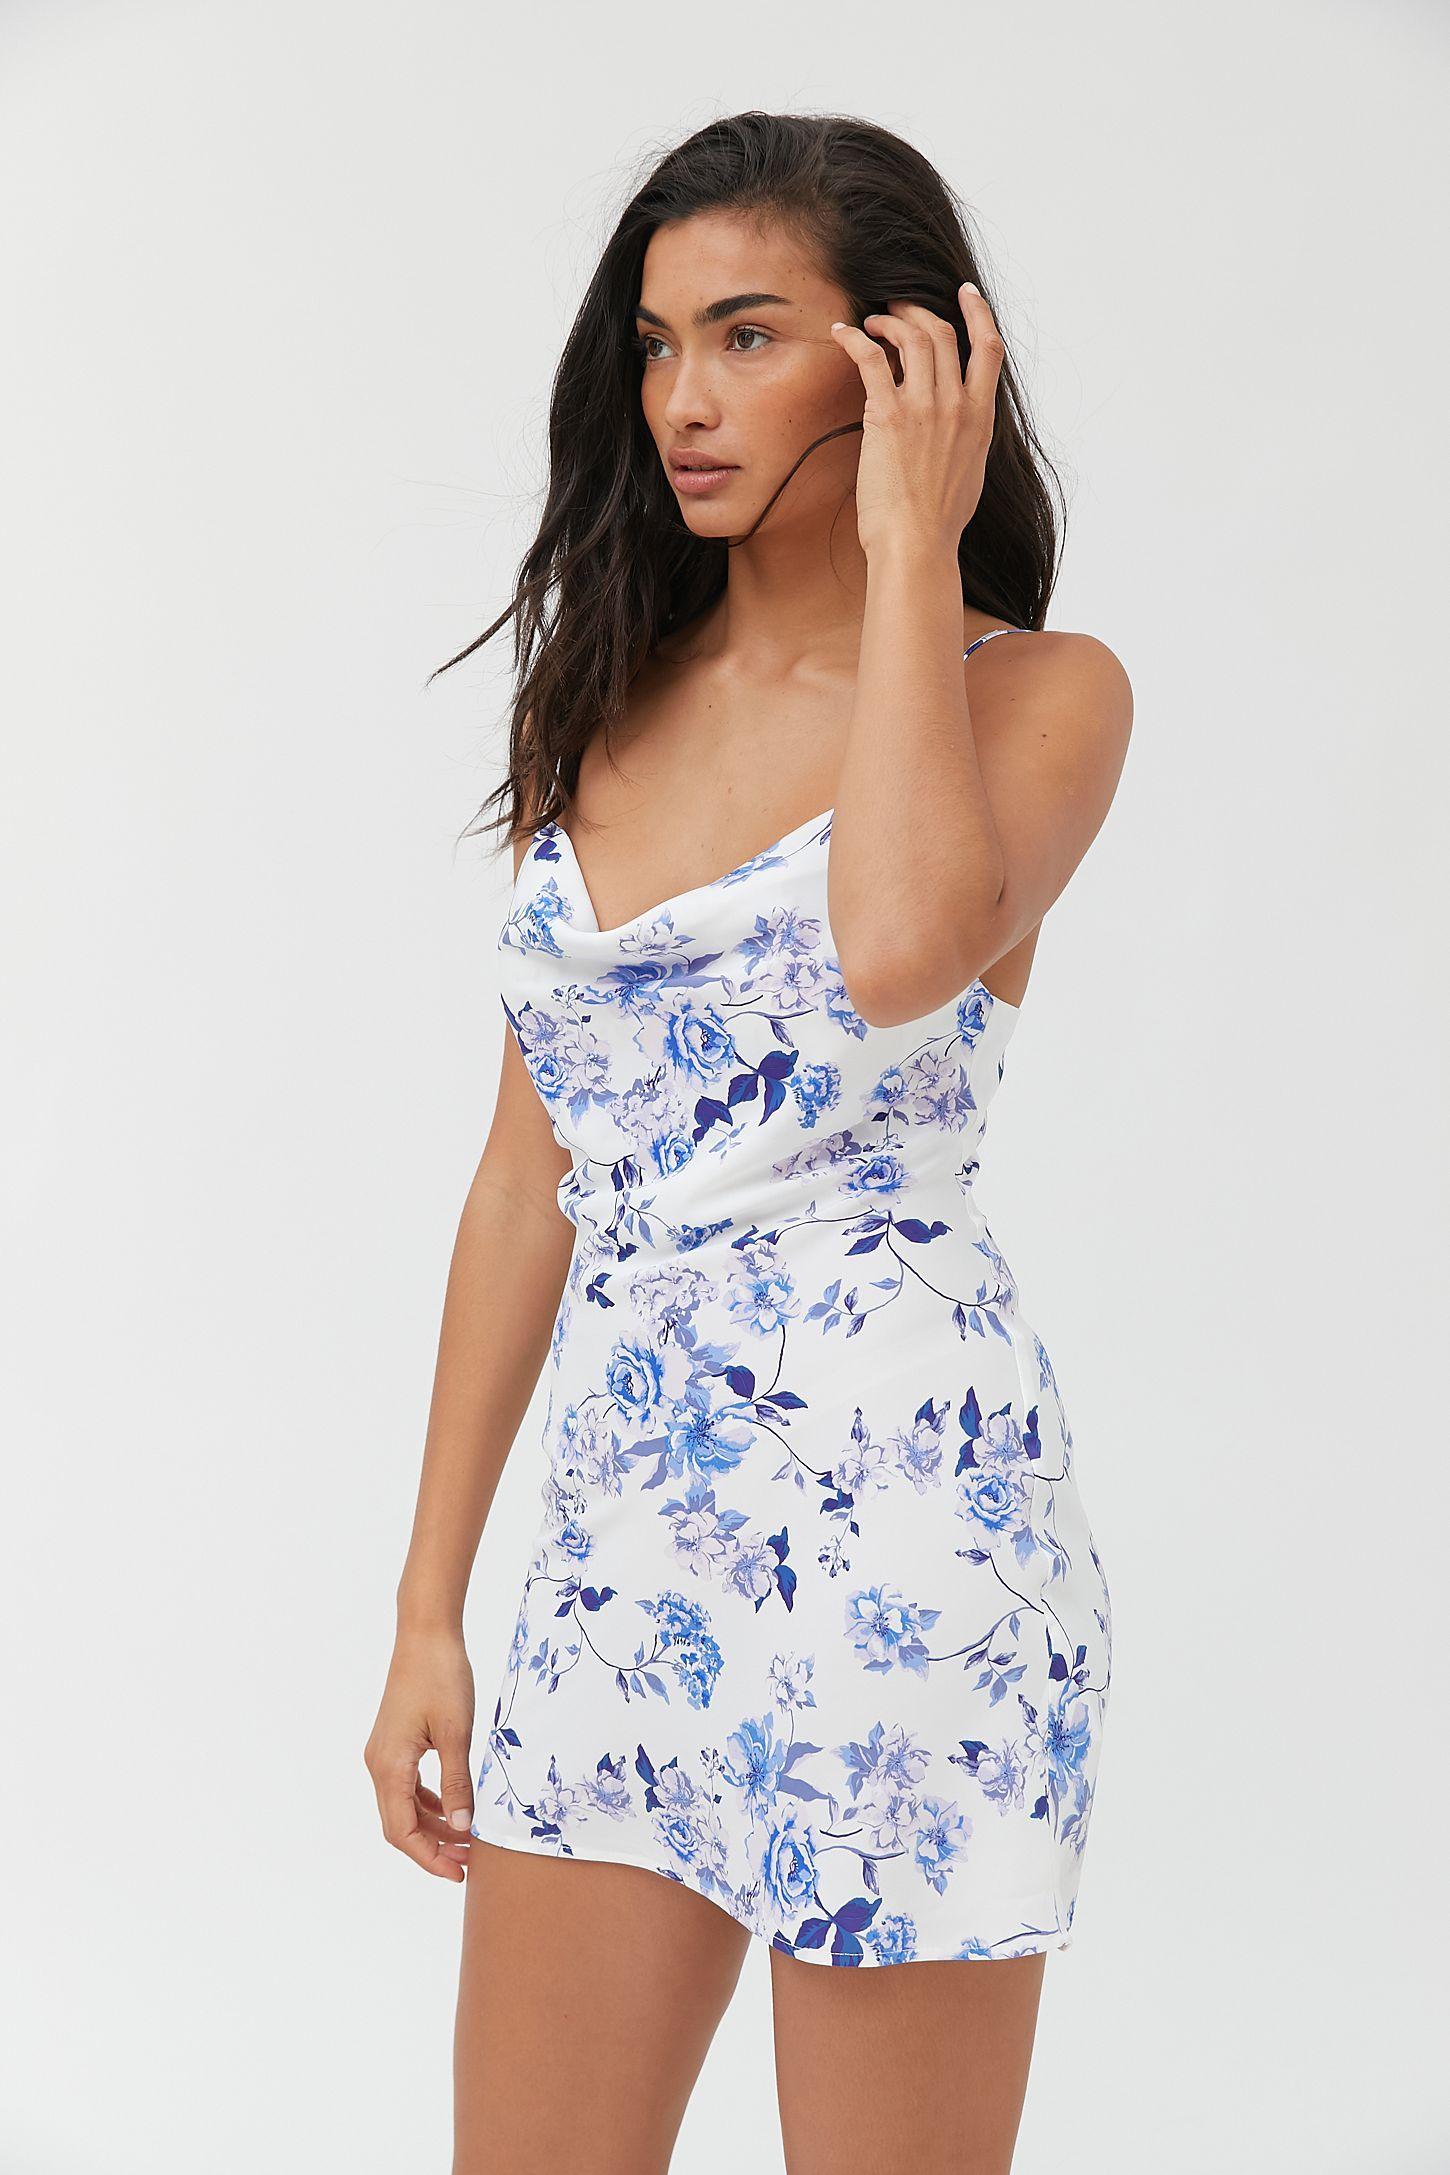 Halsey Dress Fashion Fix Where To Buy The Honey POP